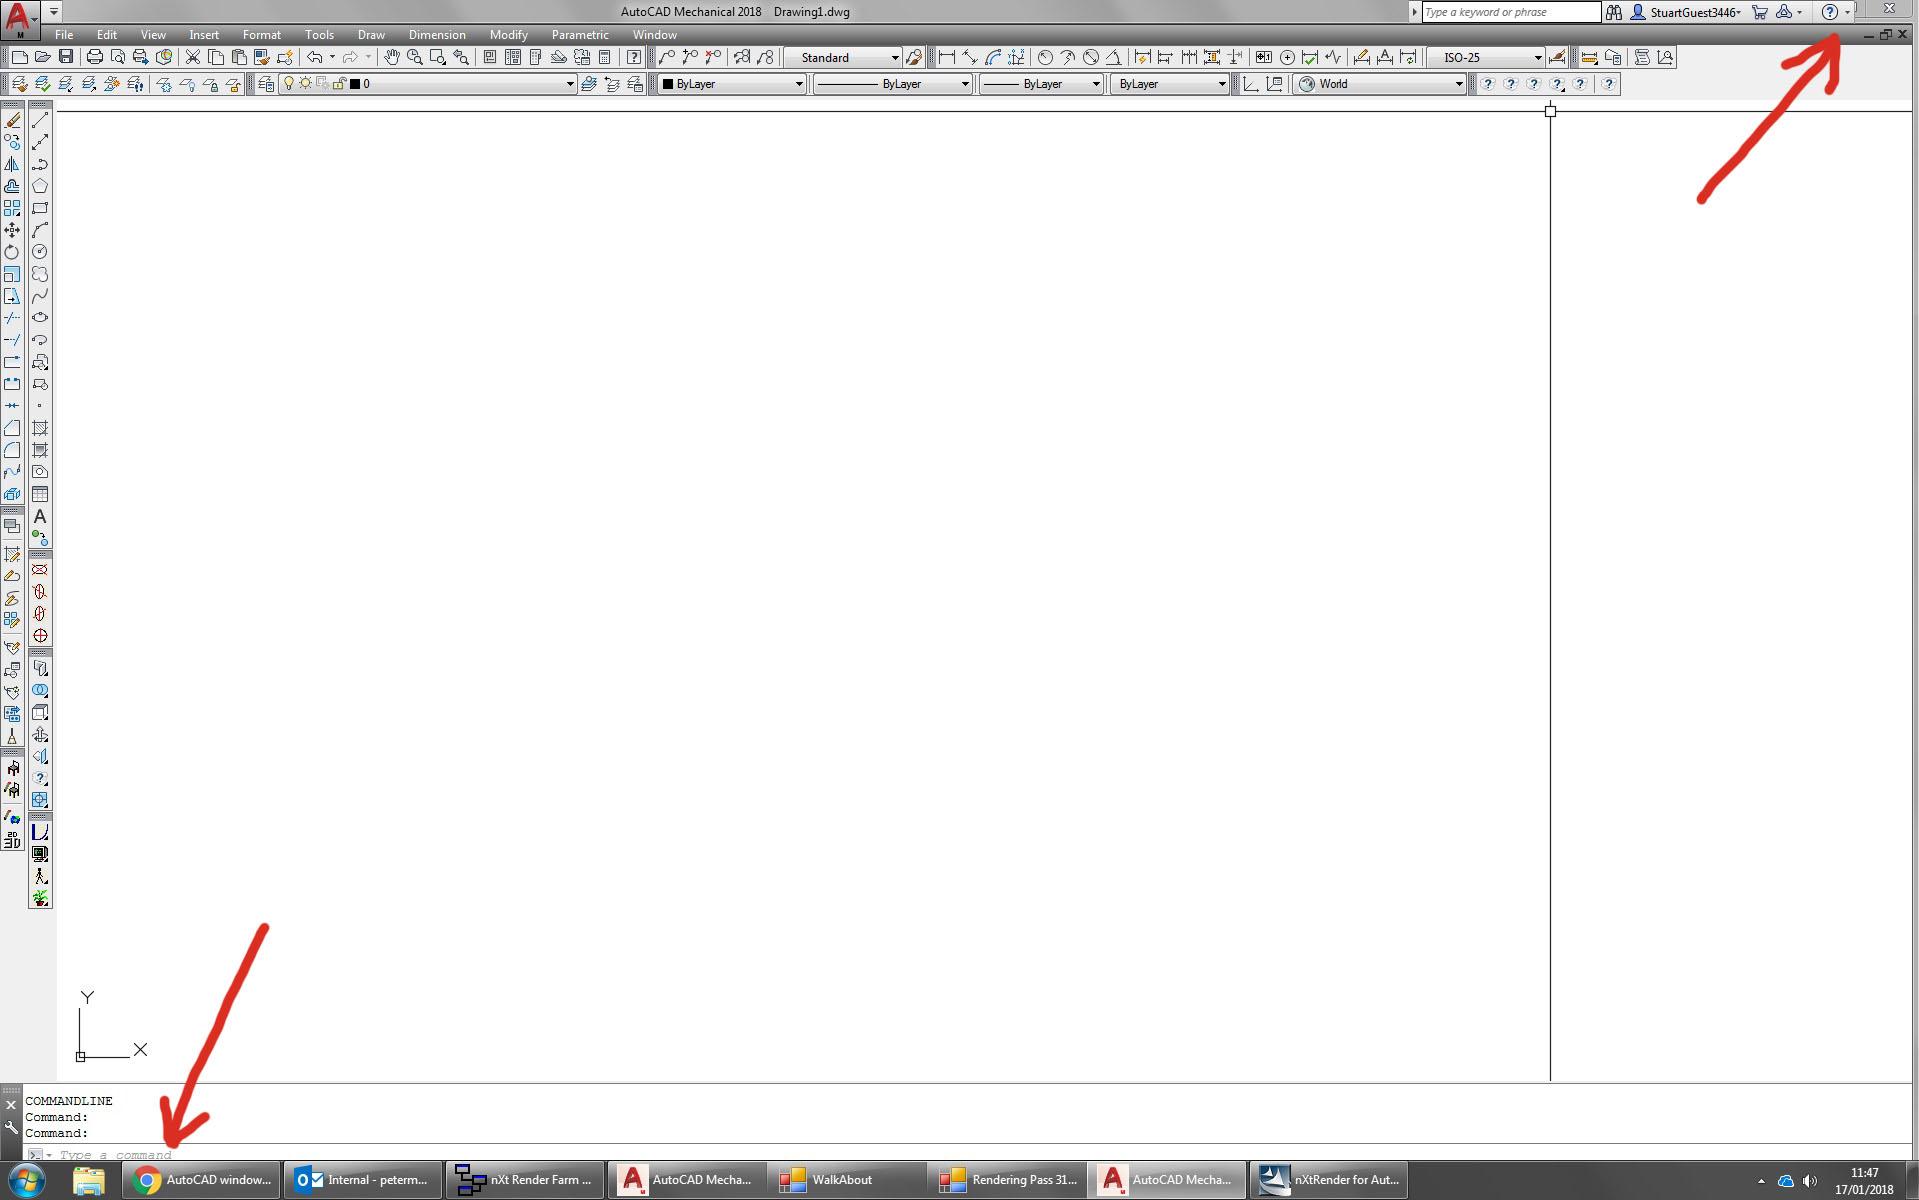 Solved: AutoCAD window not opening completely maximized - Autodesk